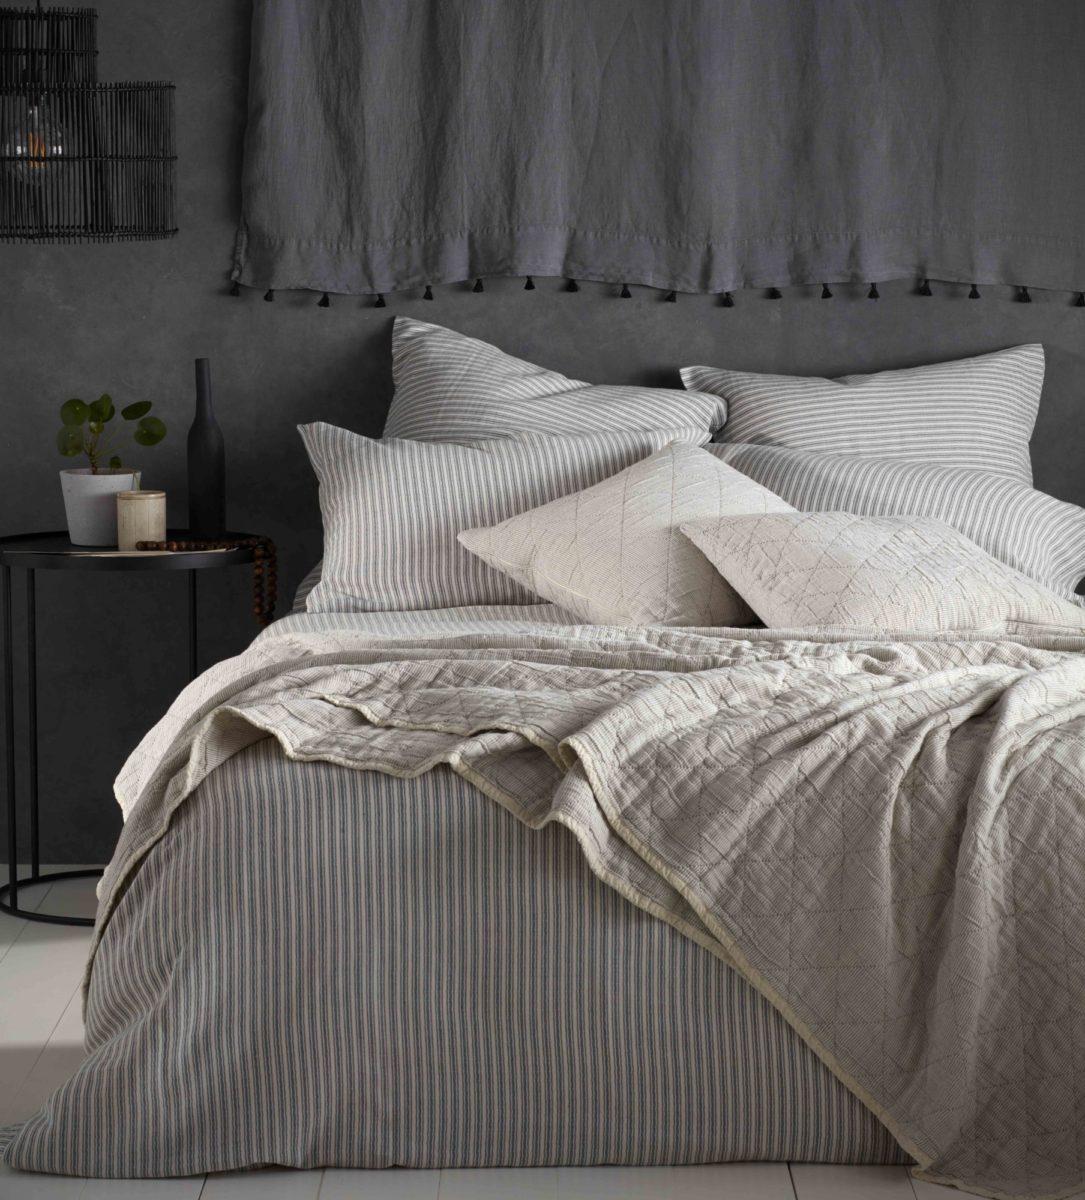 Ticking Stripe Grey Bed Linen - Ticking Stripe Grey Bed Linen